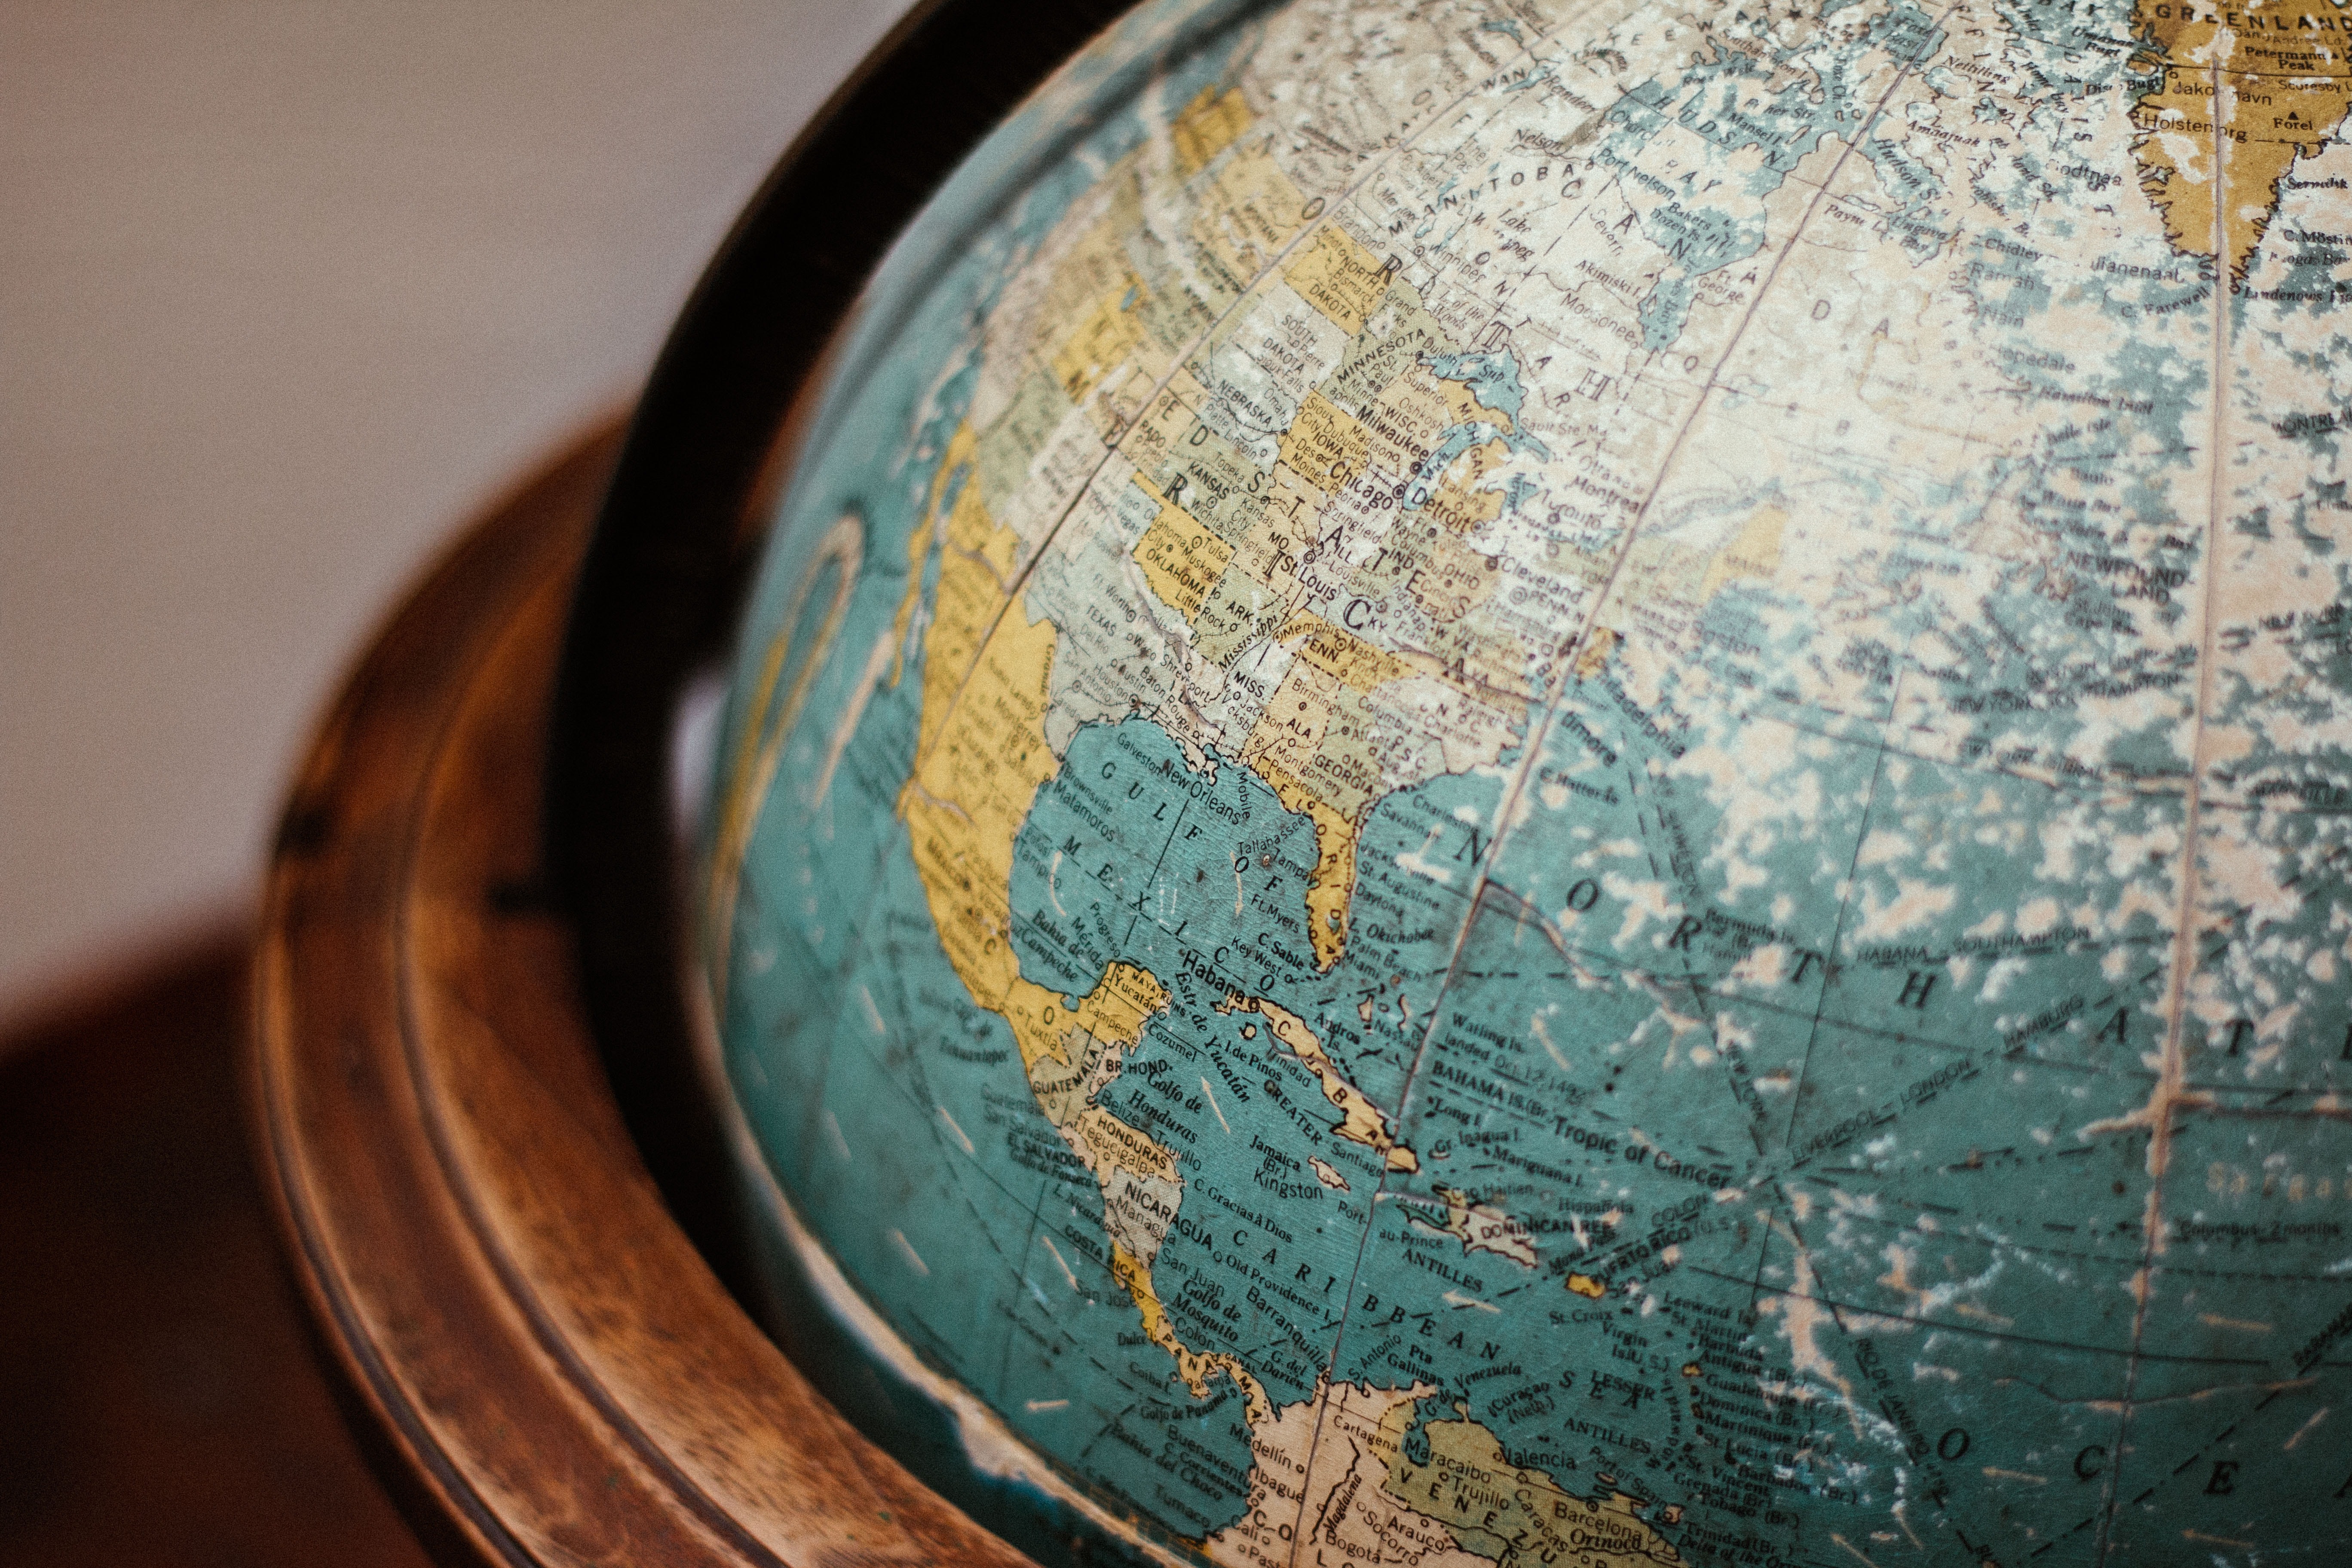 Earth Globe photo by Adolfo Félix on Unsplash